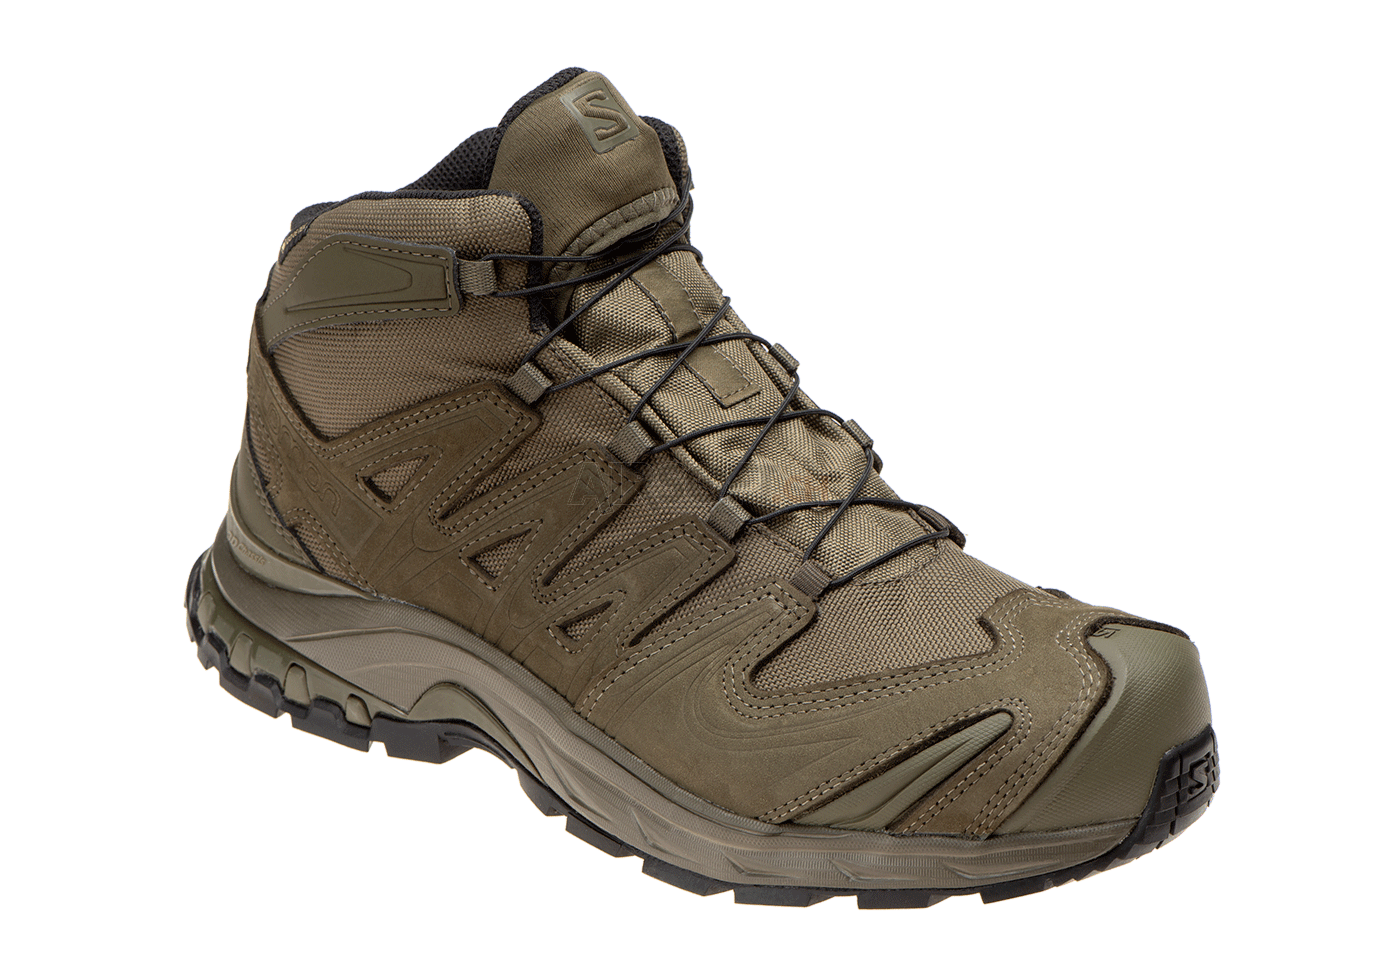 10 GreensalomonUk Gtx Mid Bottes Chaussures Xa Ranger Forces thoCBrxsQd